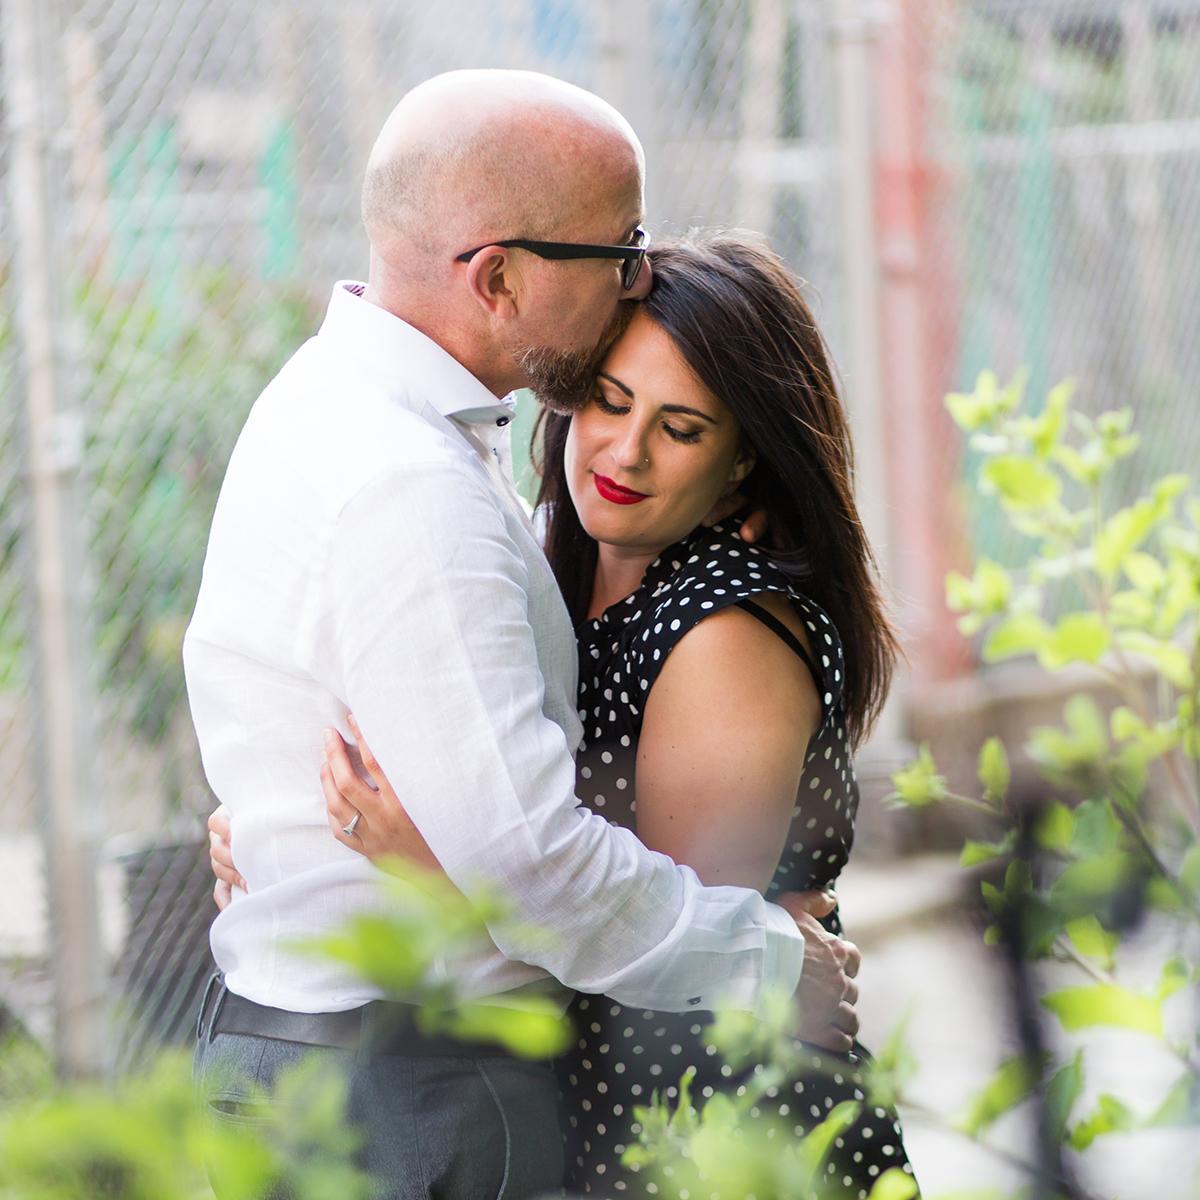 Montreal dating blogg graviditet dating skanning feil